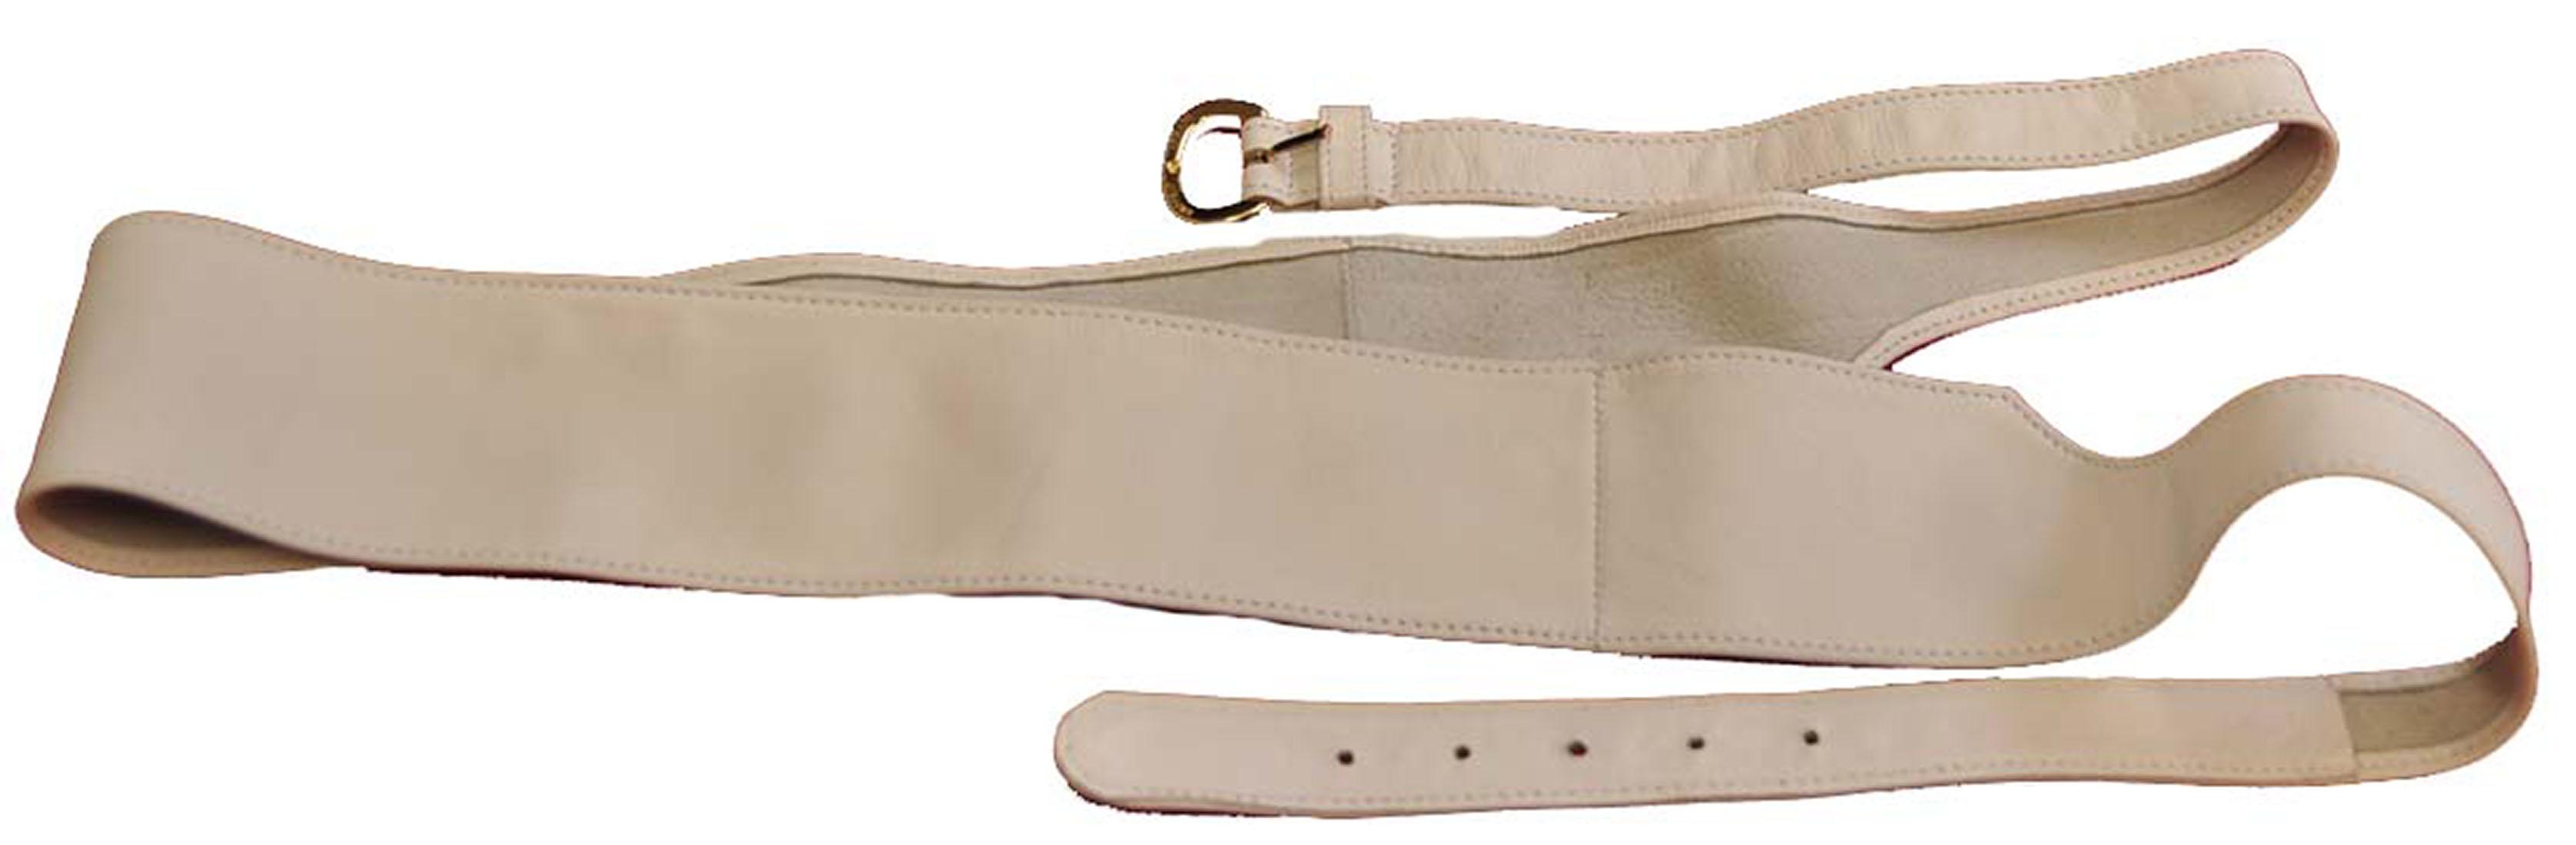 Emporio Armani WHITE Leather Belt